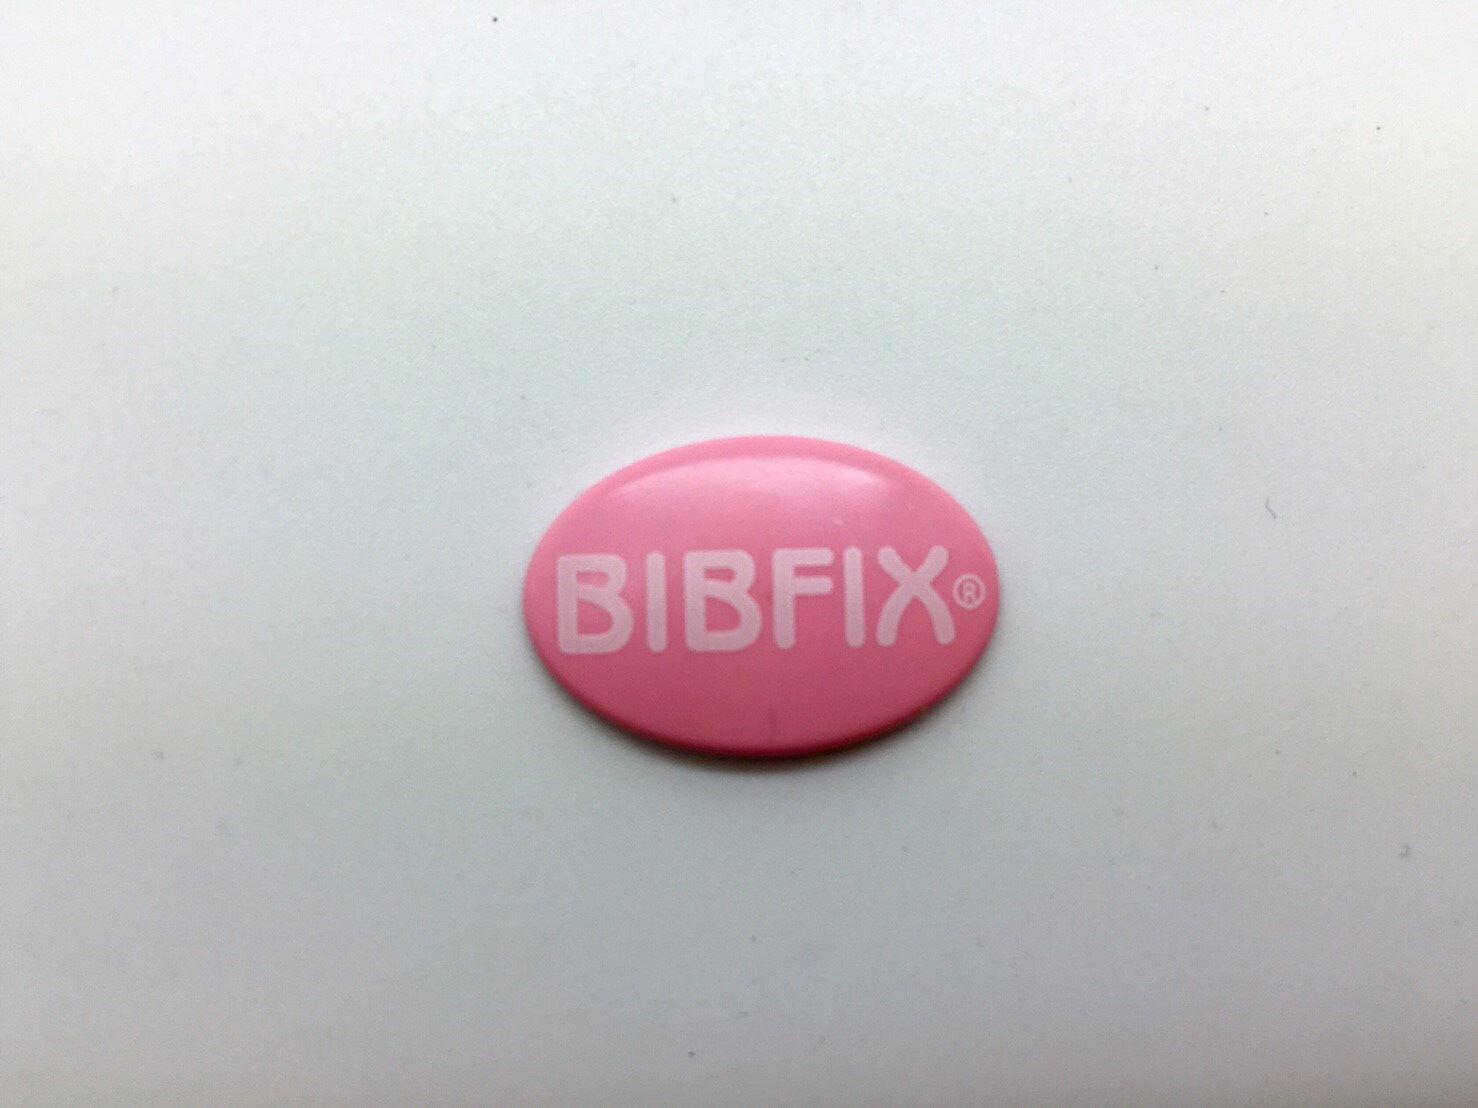 Bibfix號碼布塑膠扣 (粉紅) 附贈收納盒